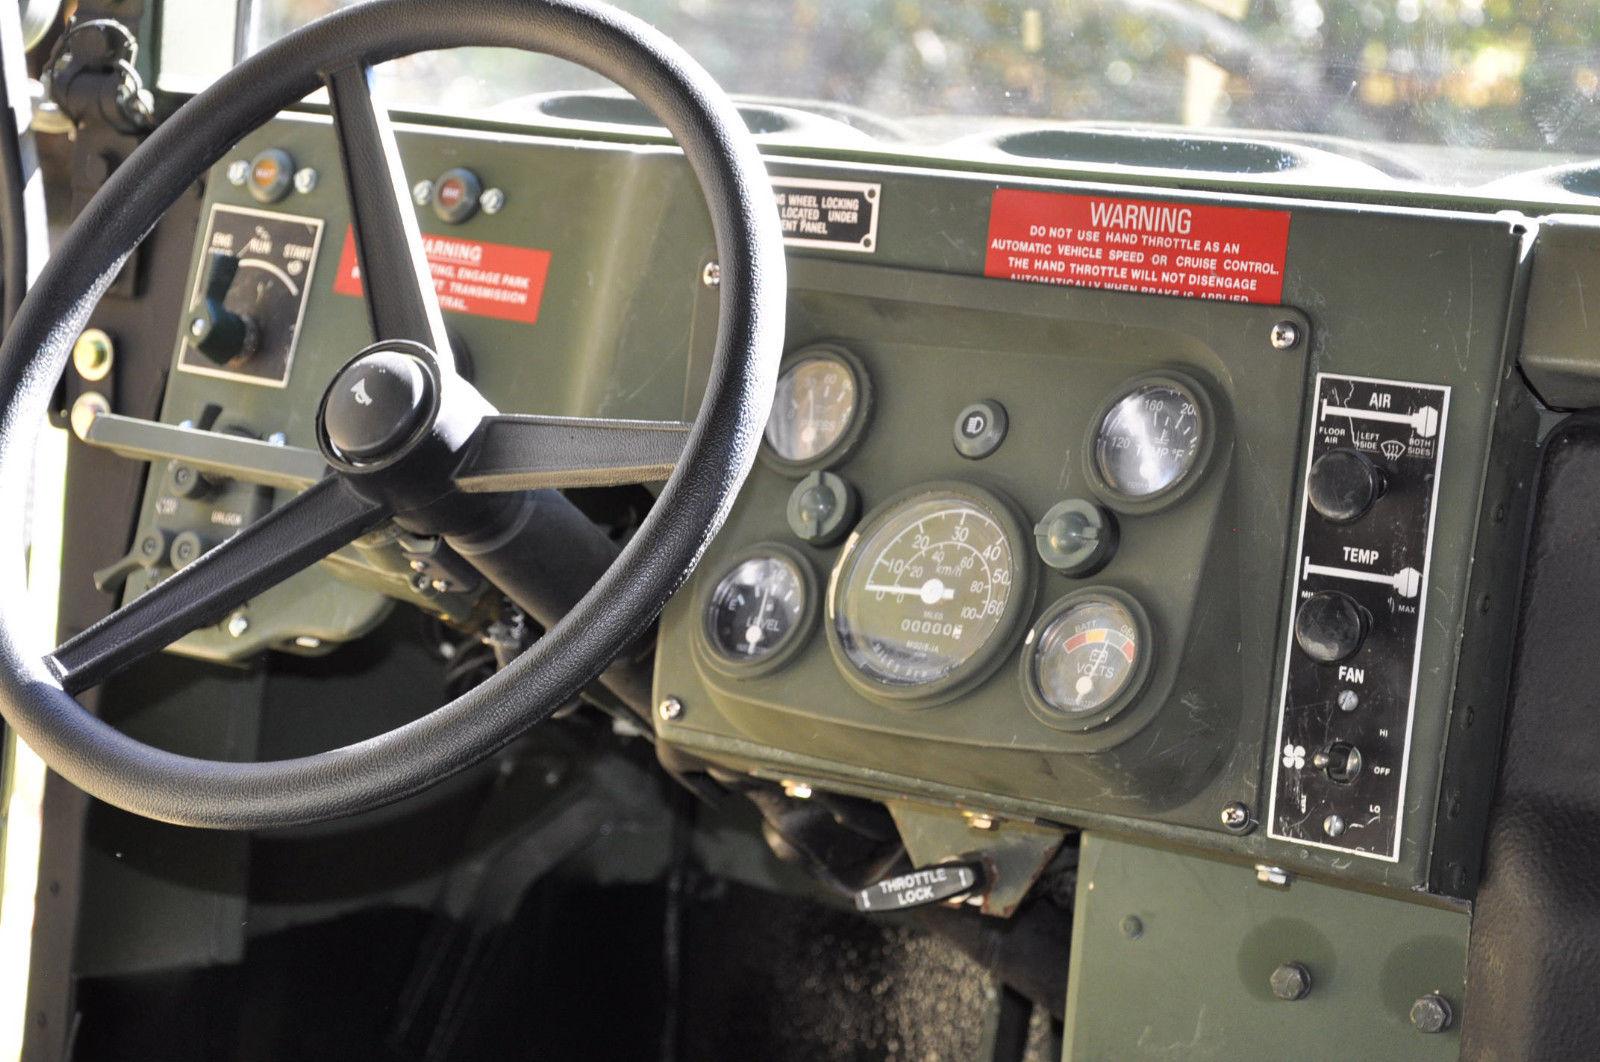 hmmwv humvee m1123 hummer enhanced restoration h1 considered trades title body accessories custom